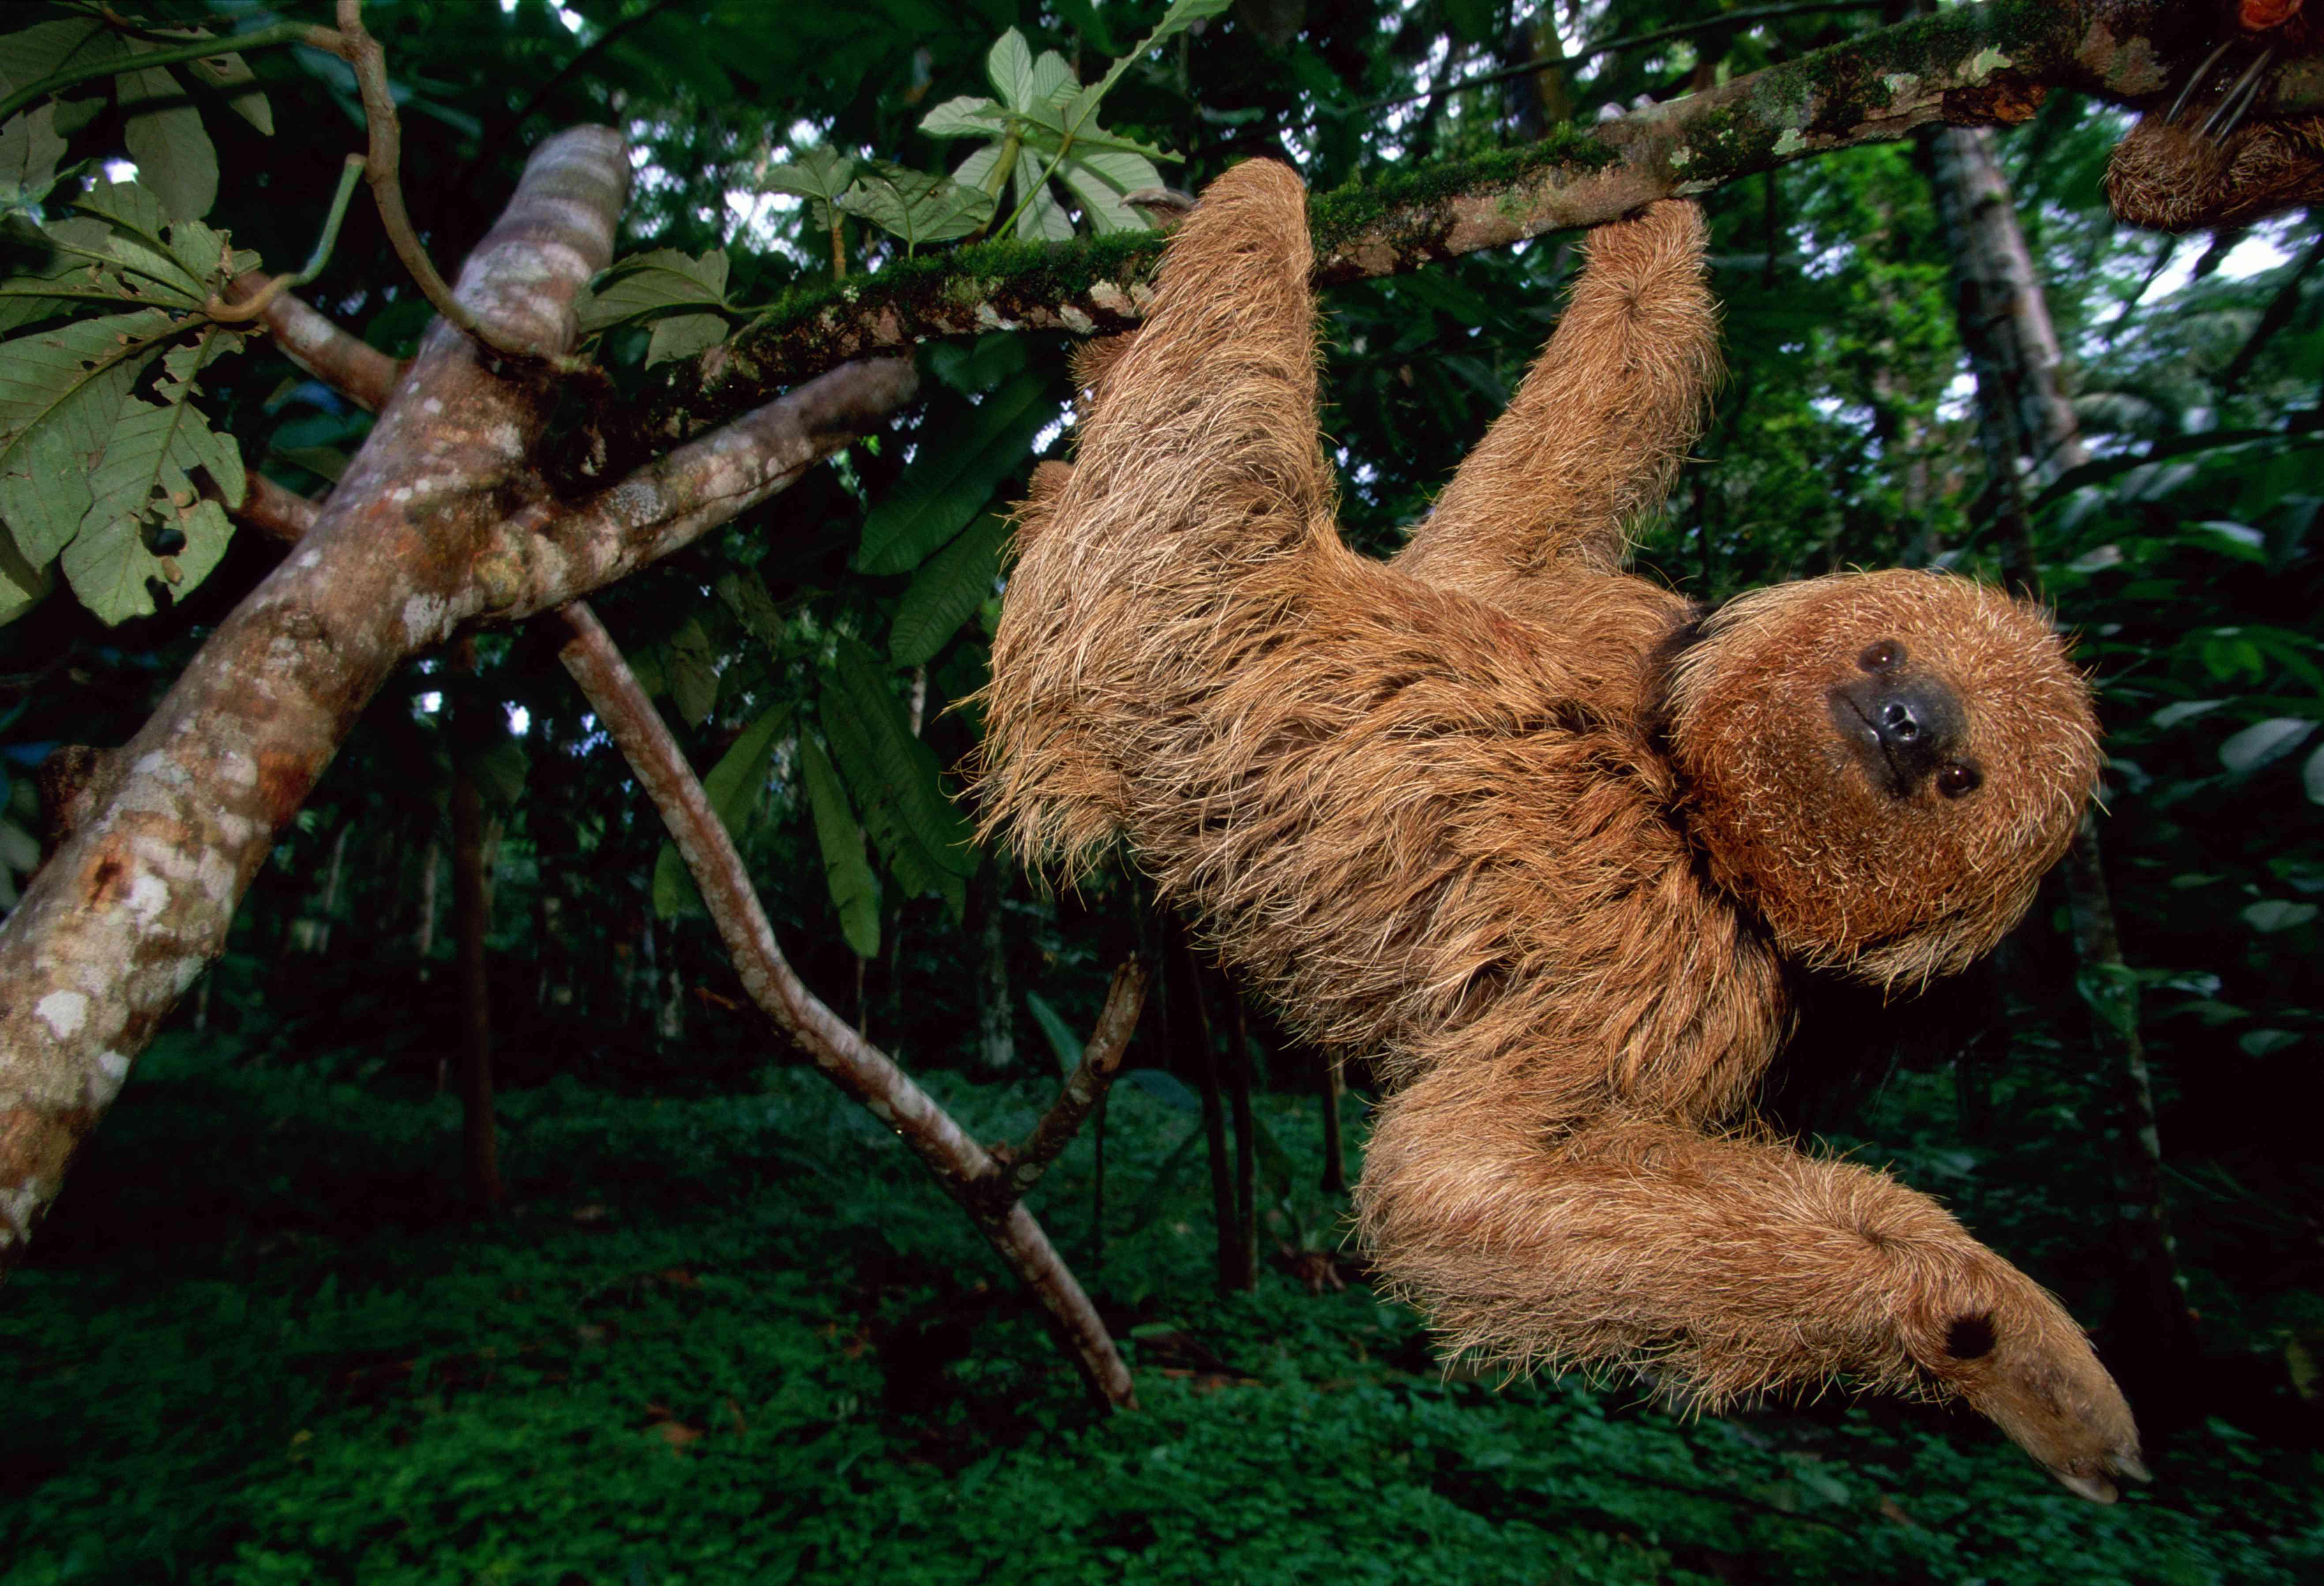 Maned sloth (Bradypus torquatus) hanging in tree, Brazil, low angle